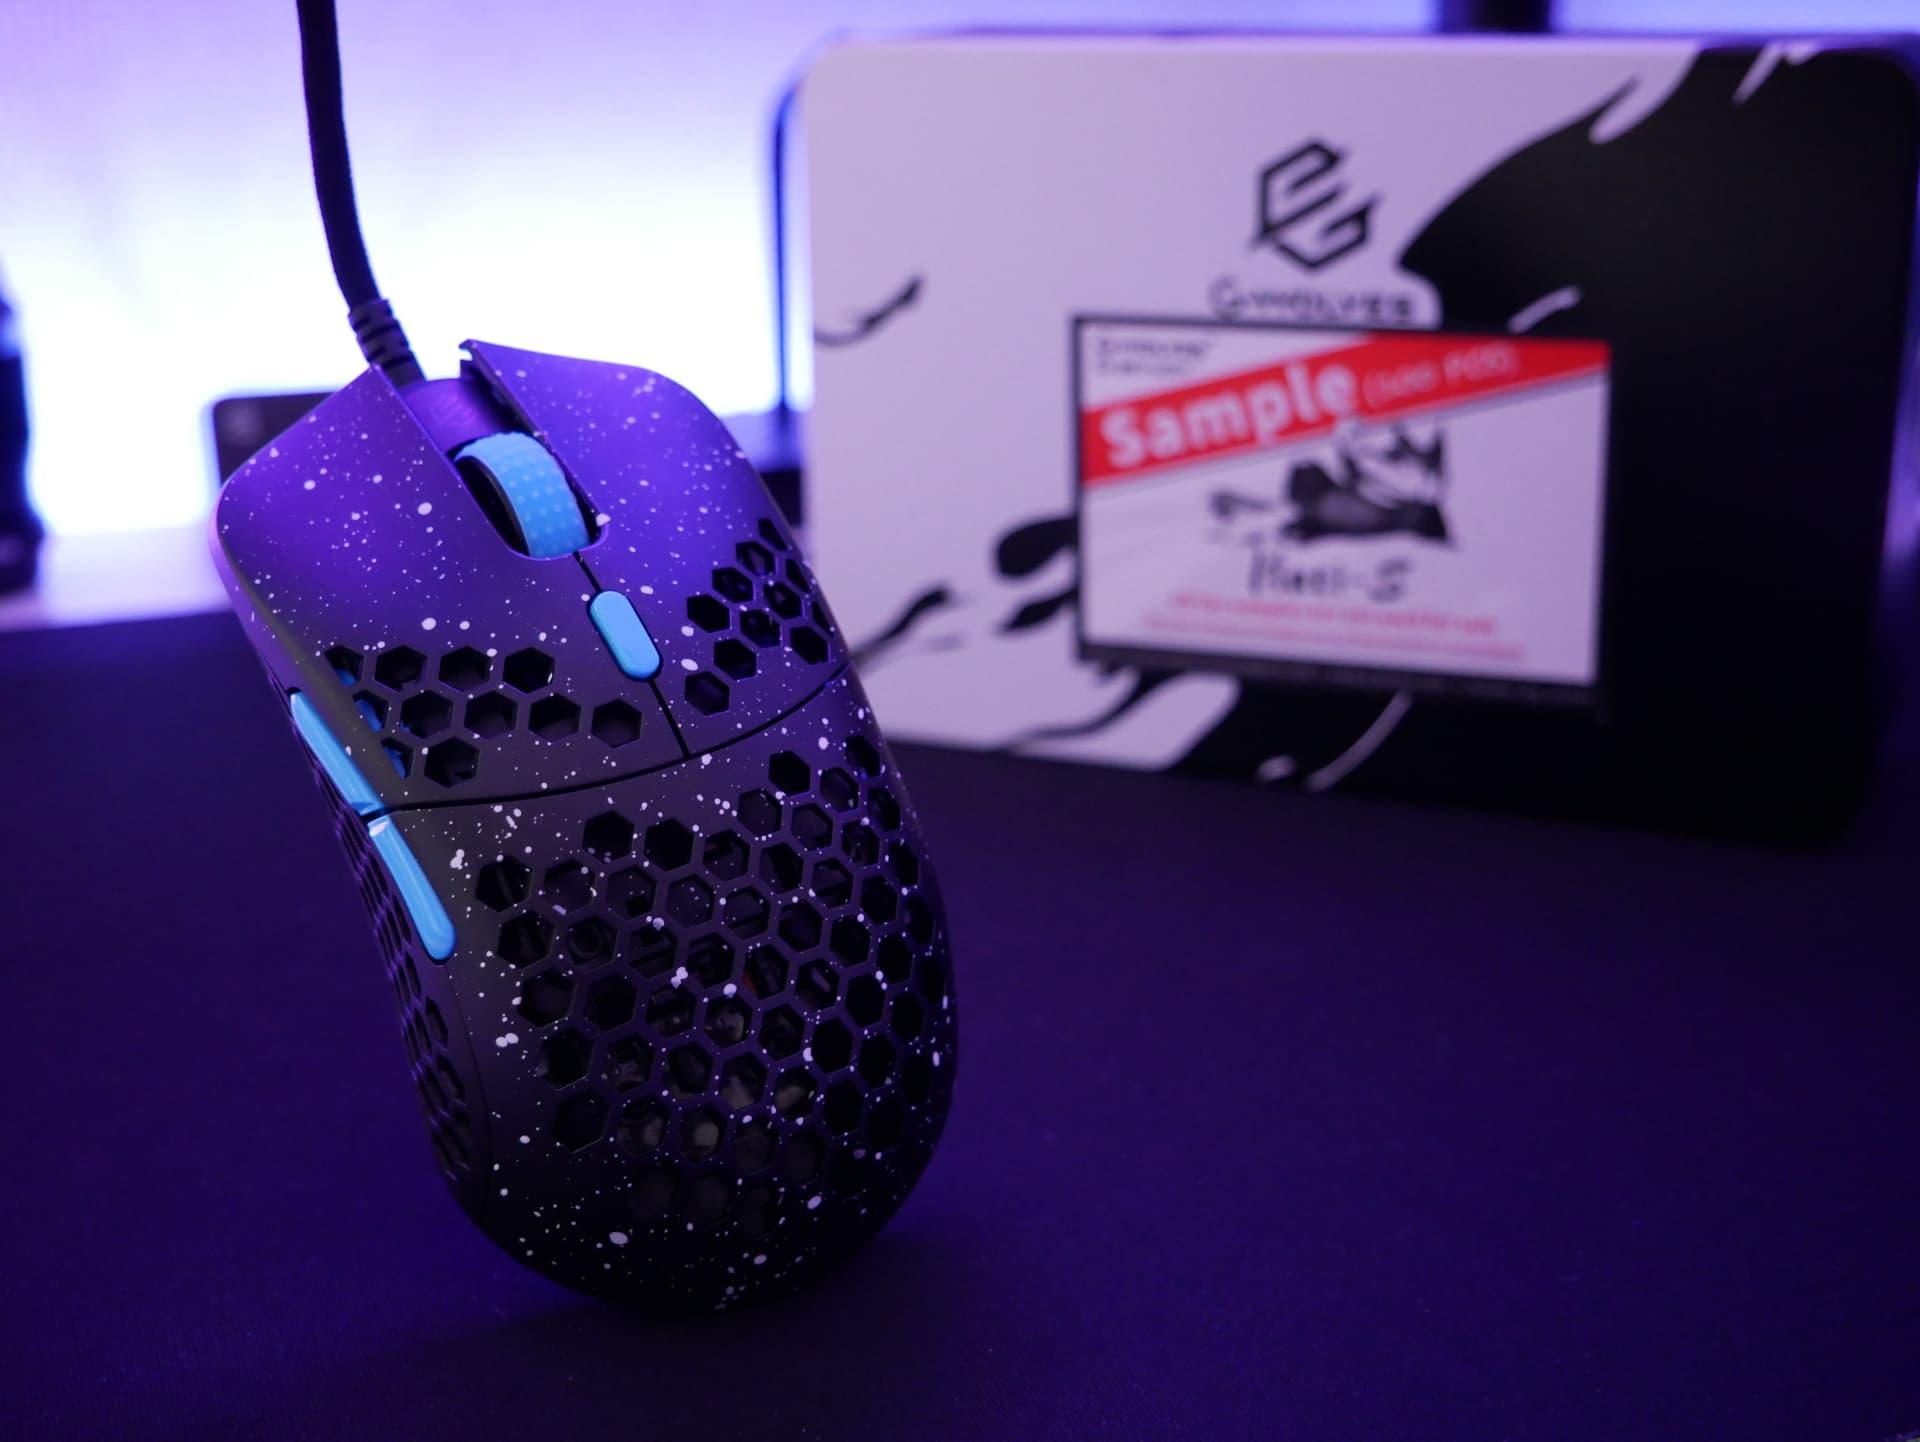 「G-wolves Hati Ht-S」レビュー。ビルドクオリティ向上、つまみ持ちに最適な小型軽量ゲーミングマウス